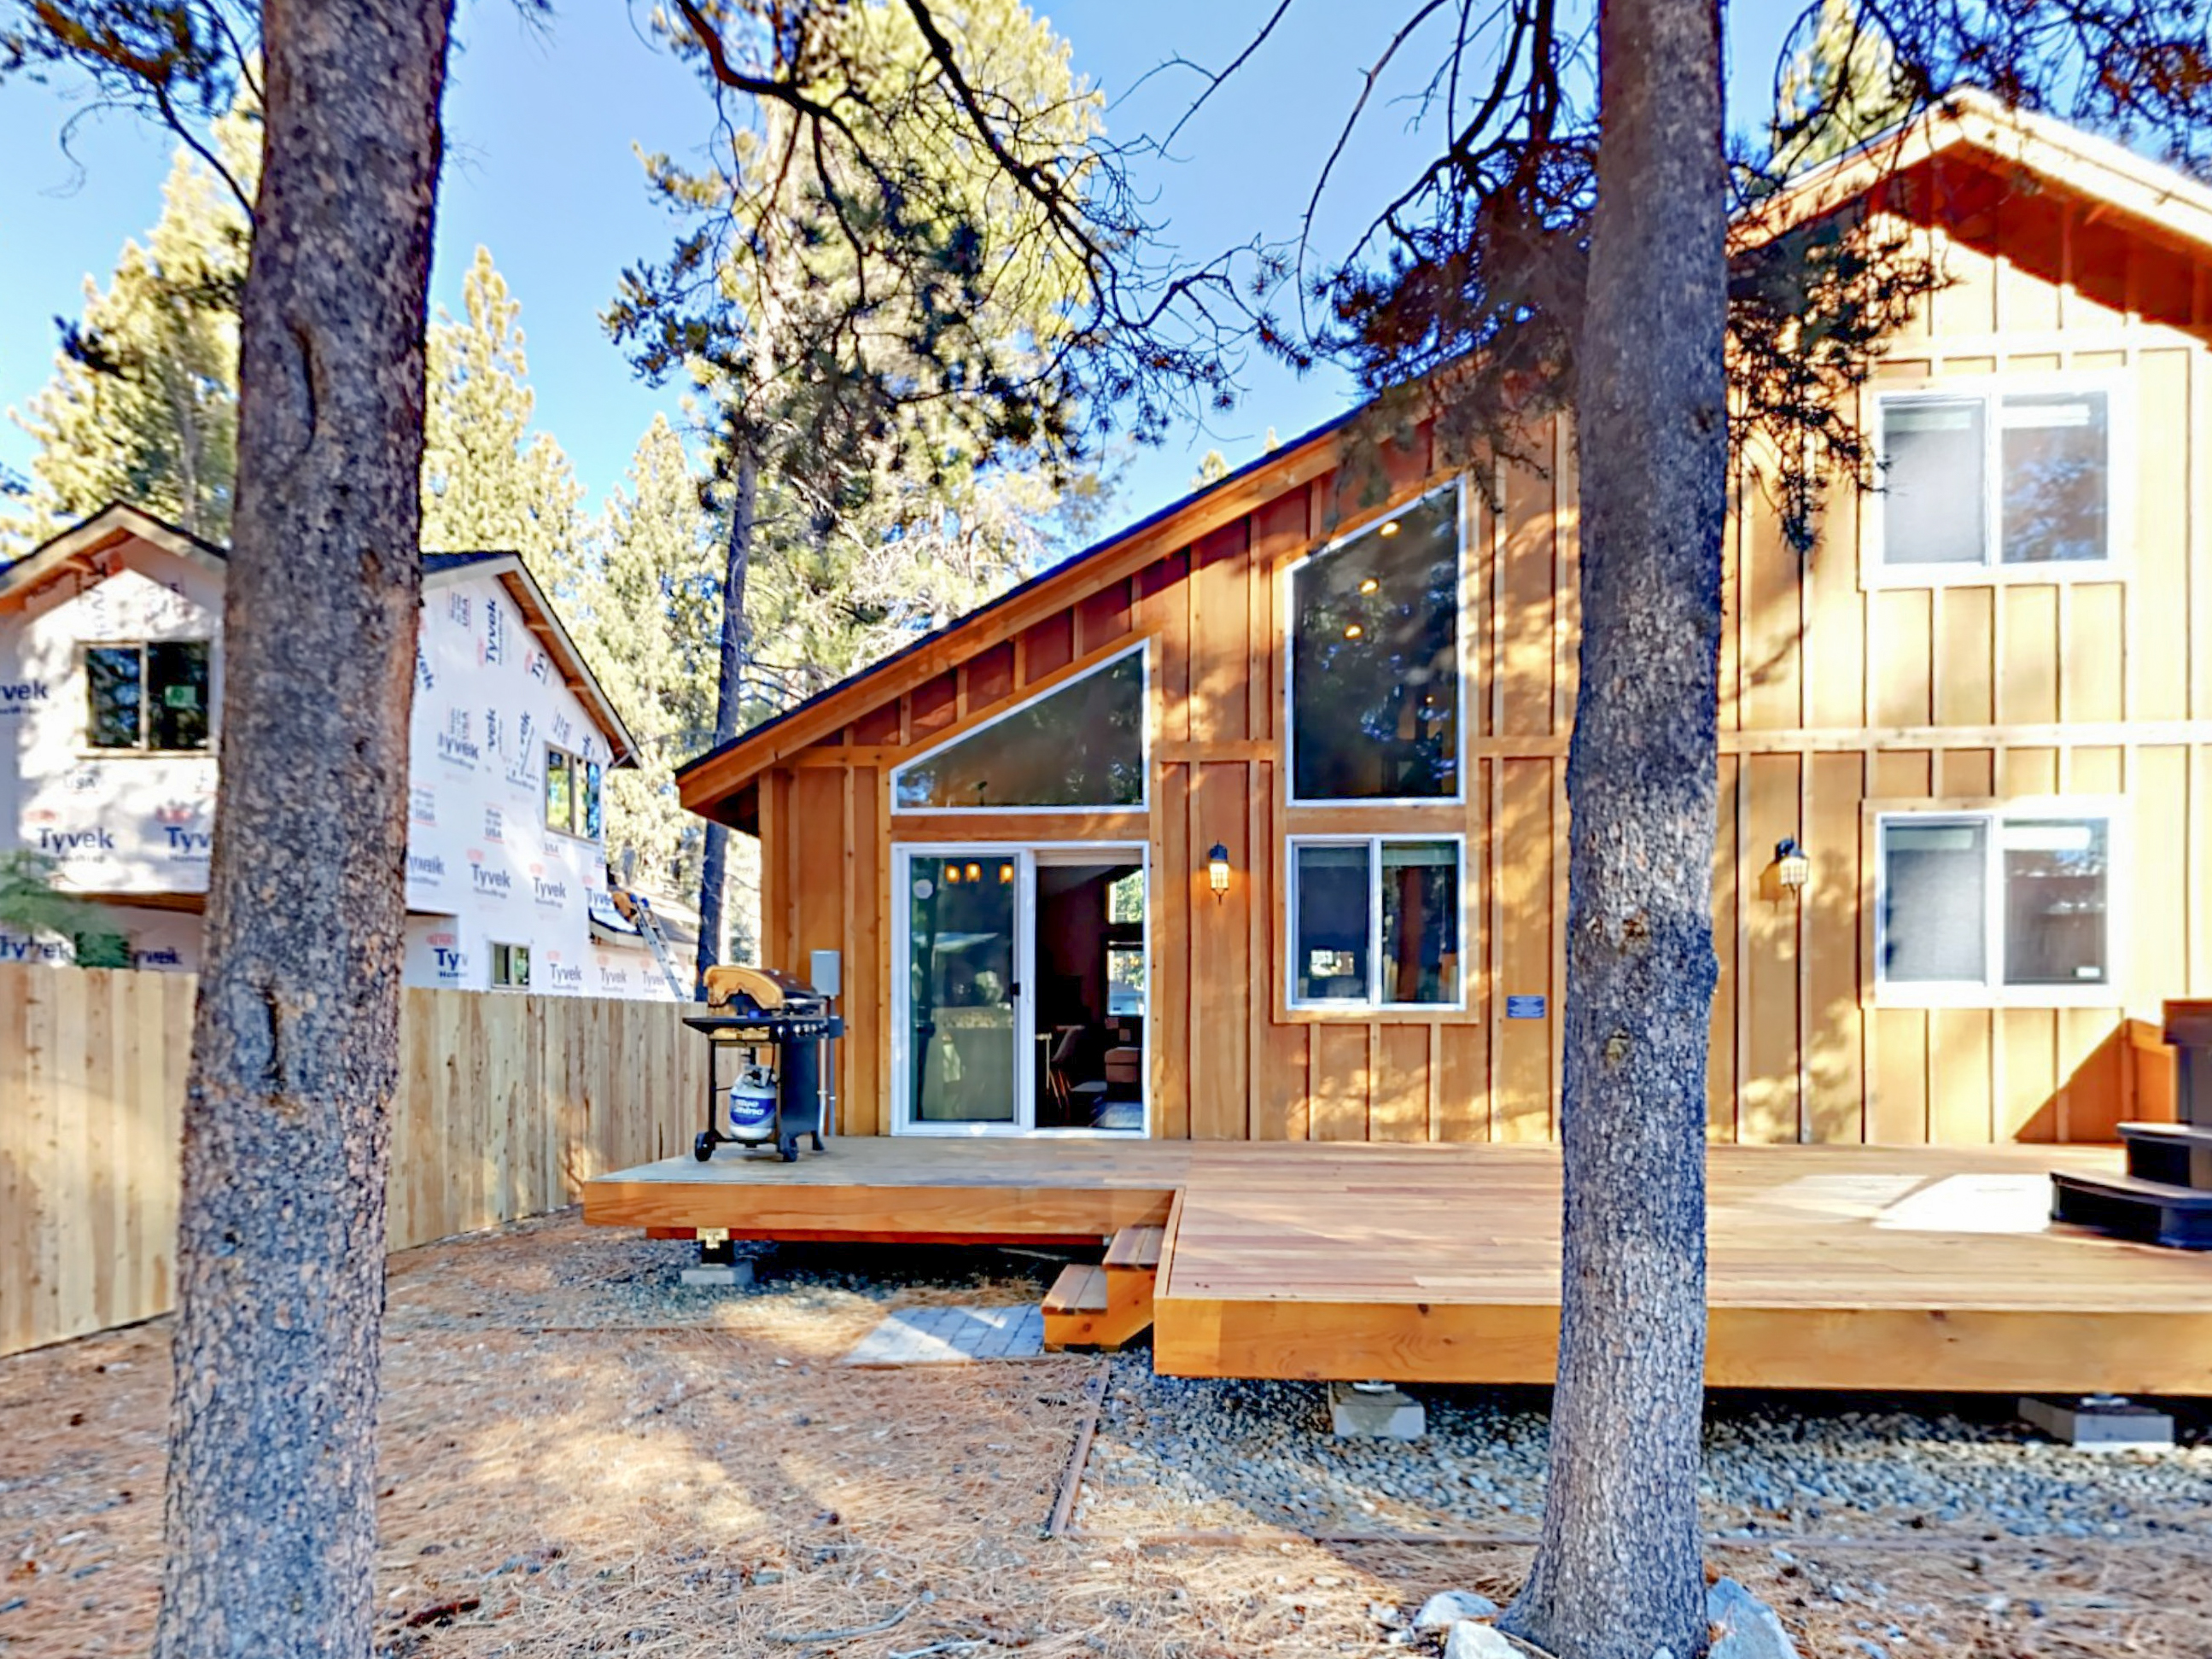 authentic moonlight craftsmanship food function and balances cabins lodge slow lake rentals tahoe between luxury properties elegance balance